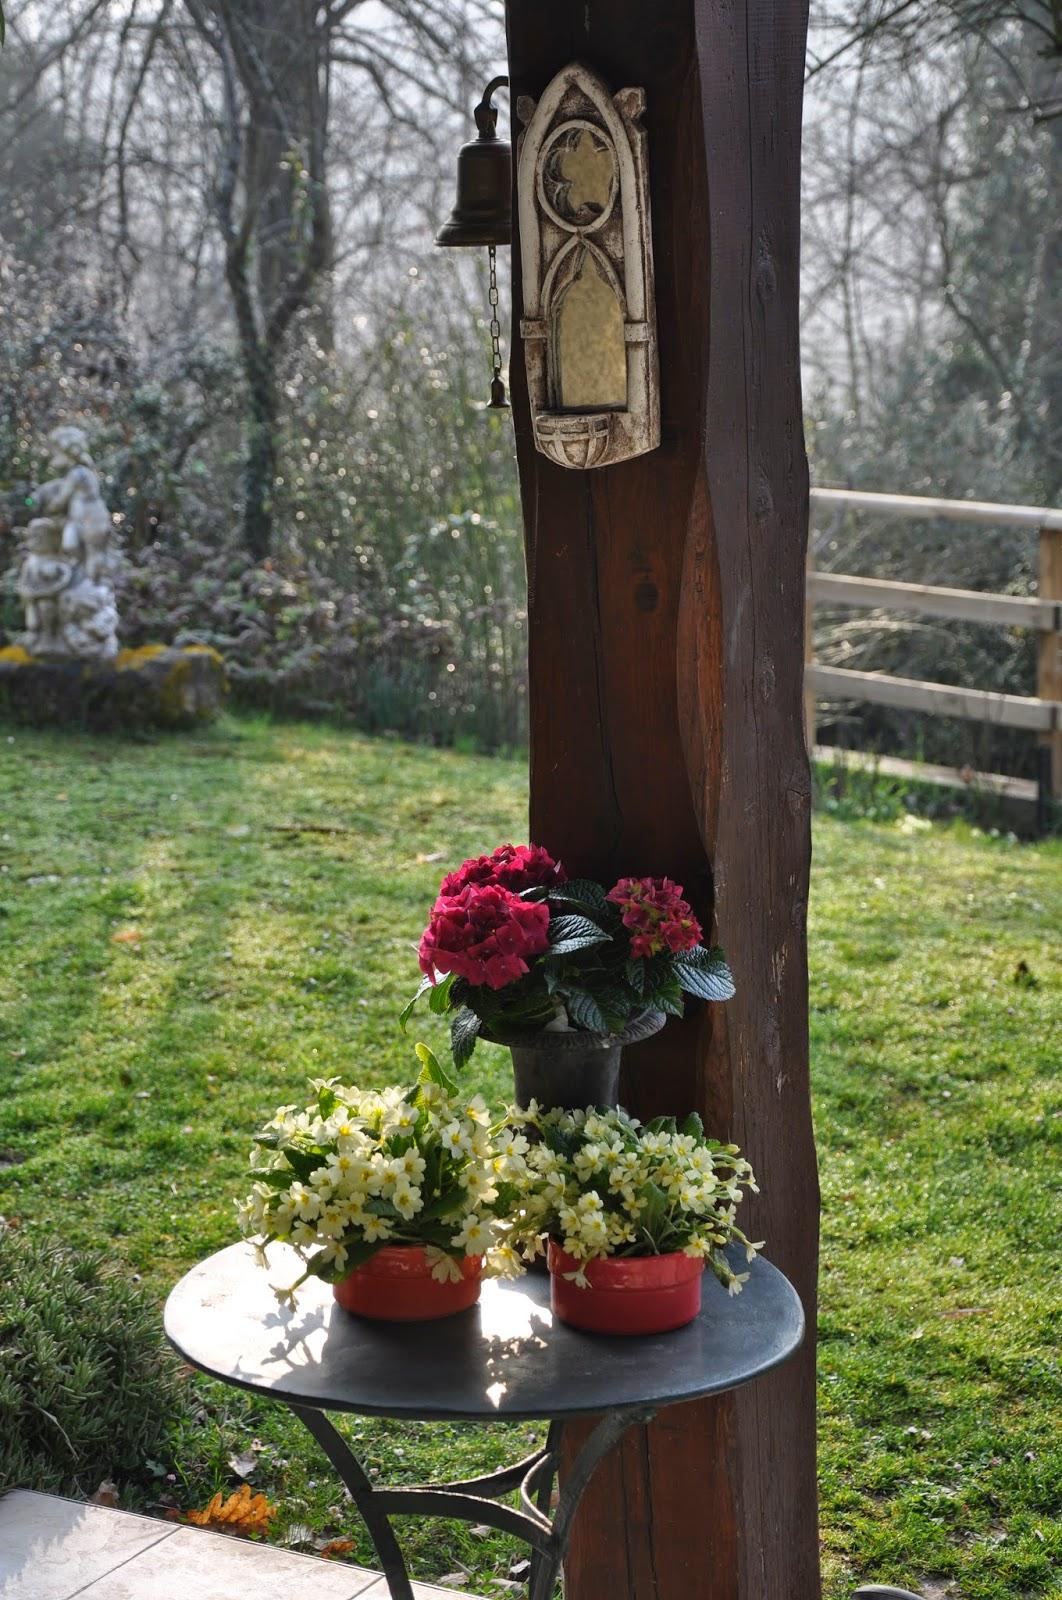 Le jardin du bois joli mars 2015 for Jardin mars 2015